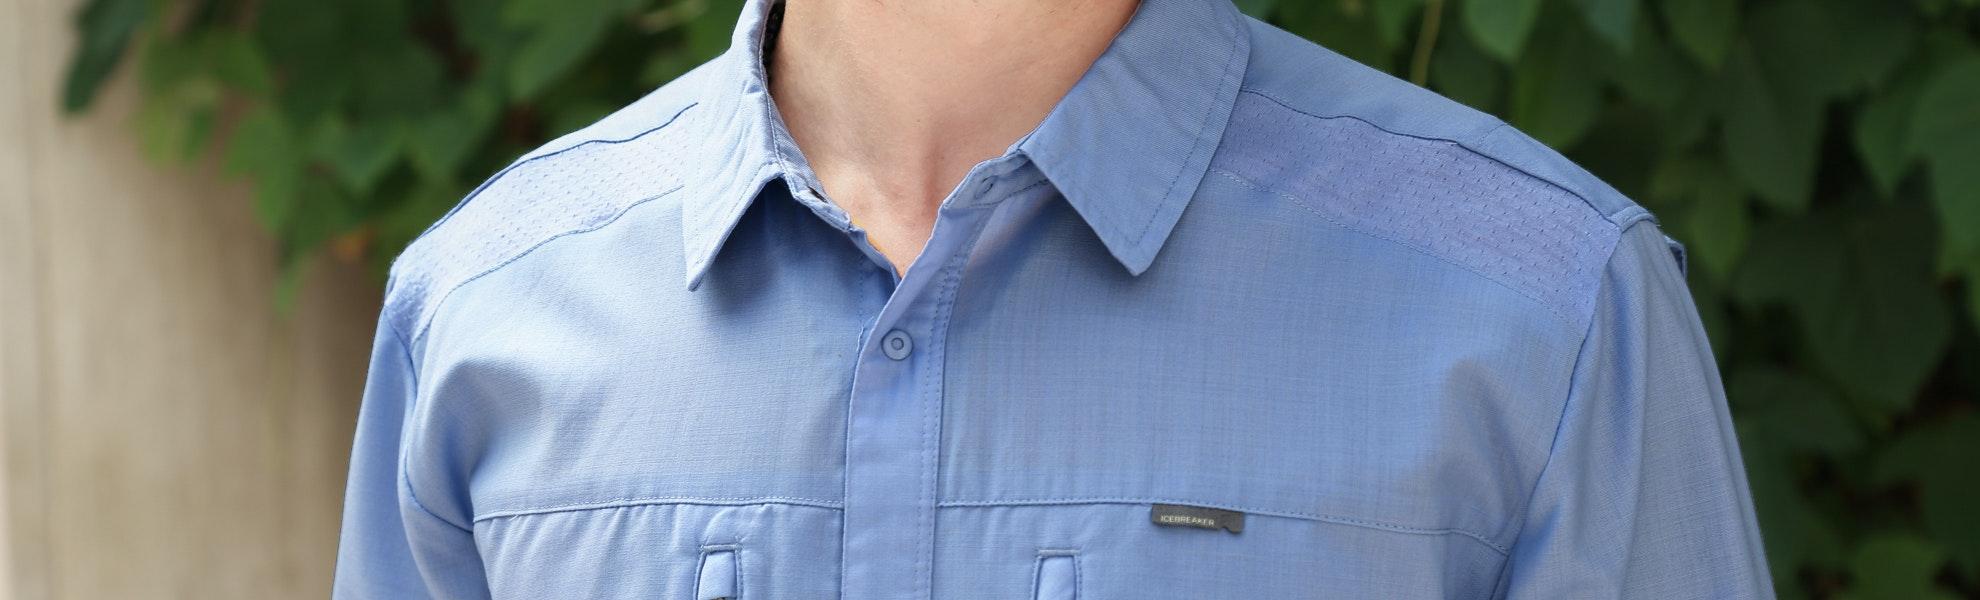 Icebreaker Men's Merino Oreti Shirt Closeout